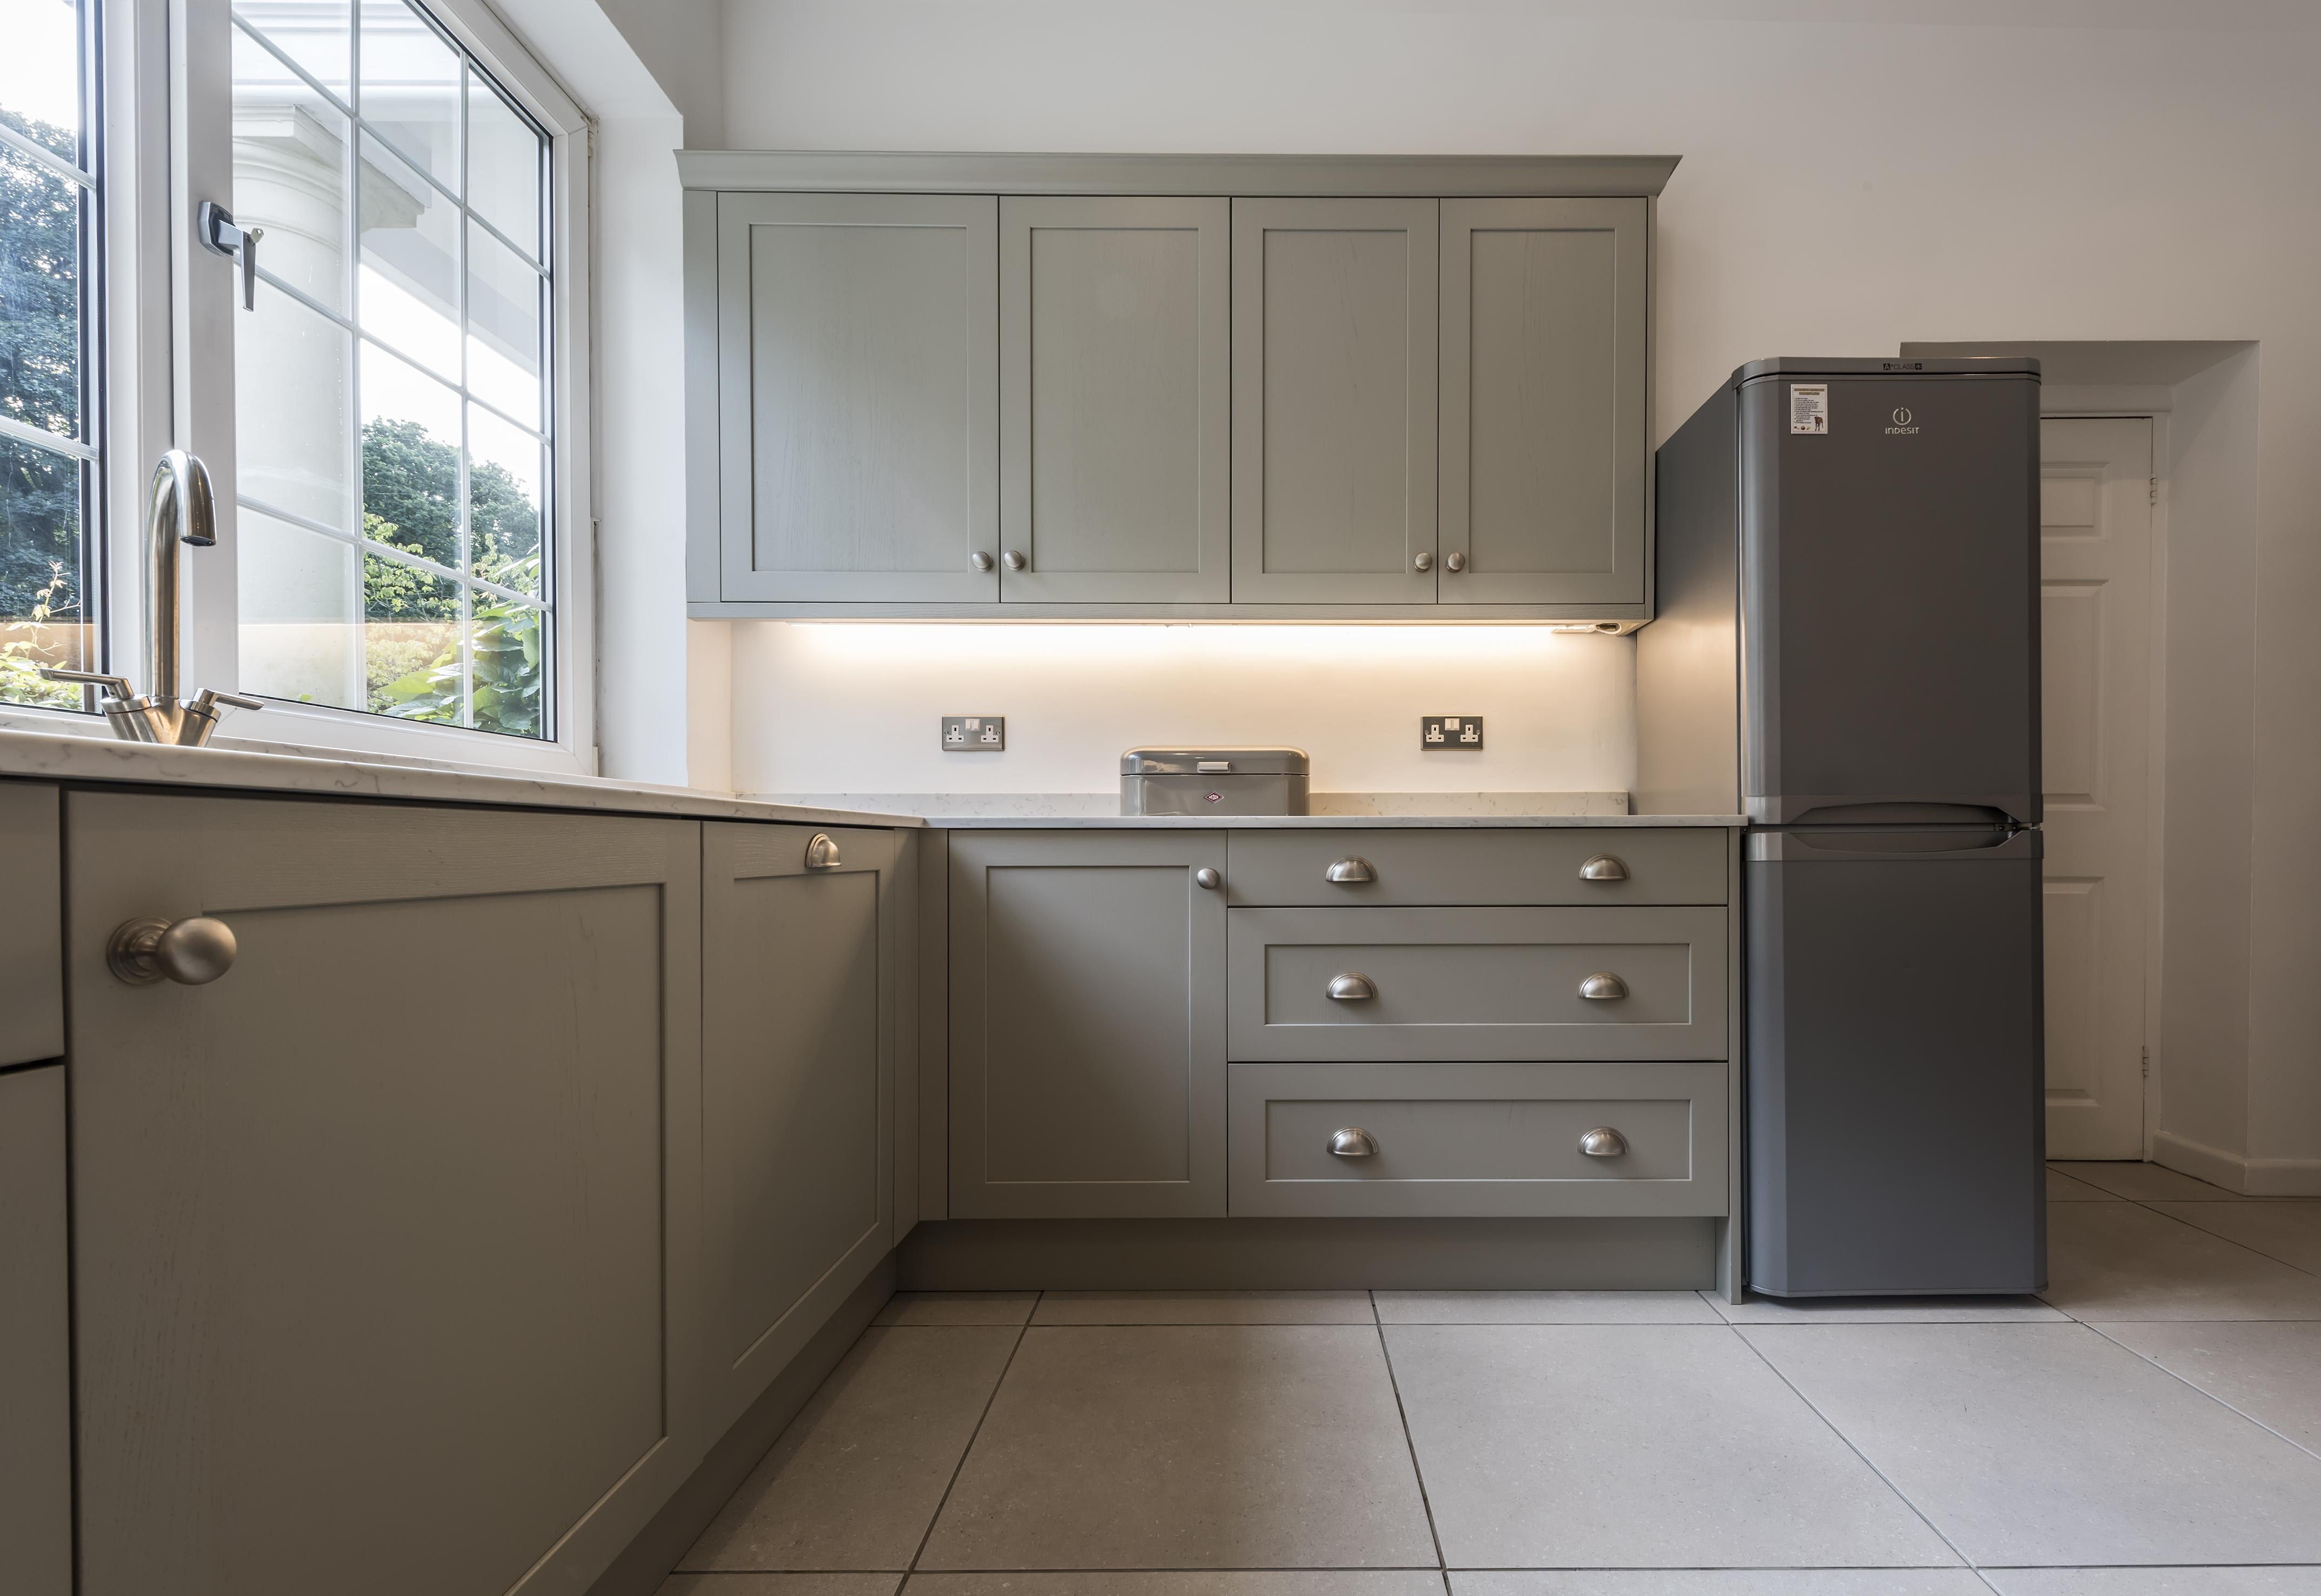 Portishead Aldana Stone Kitchen Handles